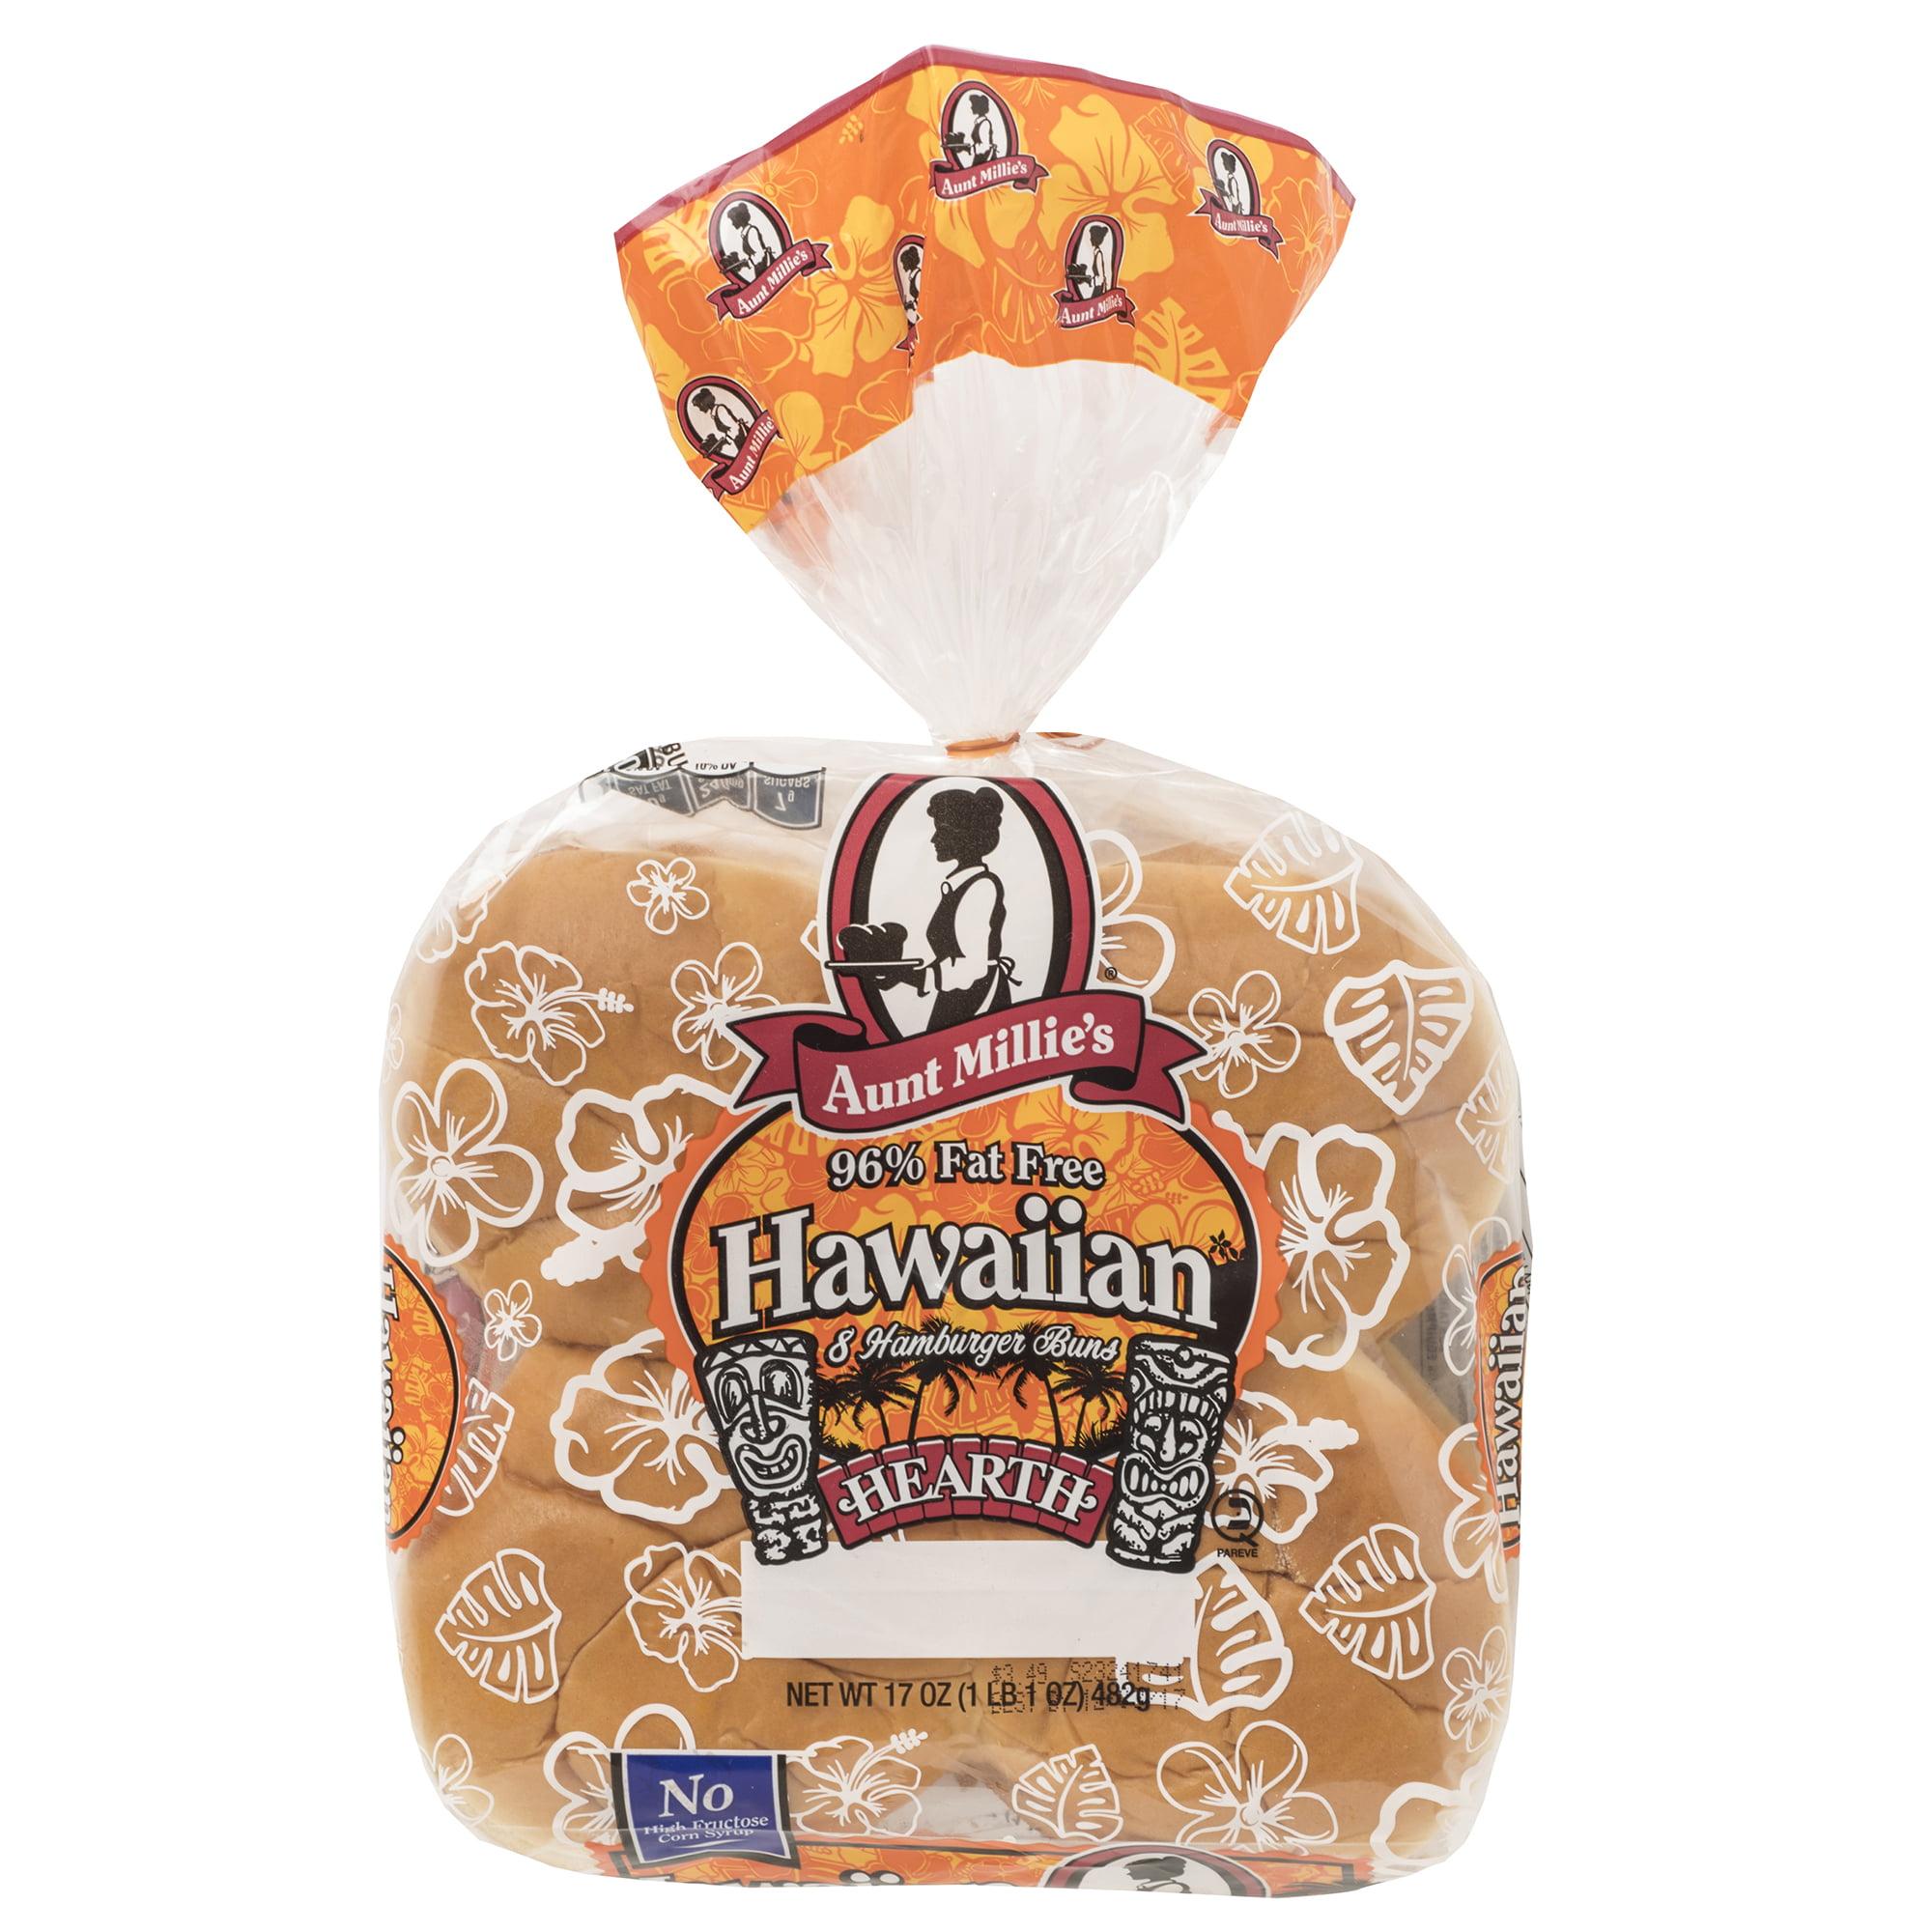 Aunt Millie's Hawaiian Hamburger Buns, 8 ct., 17 oz.